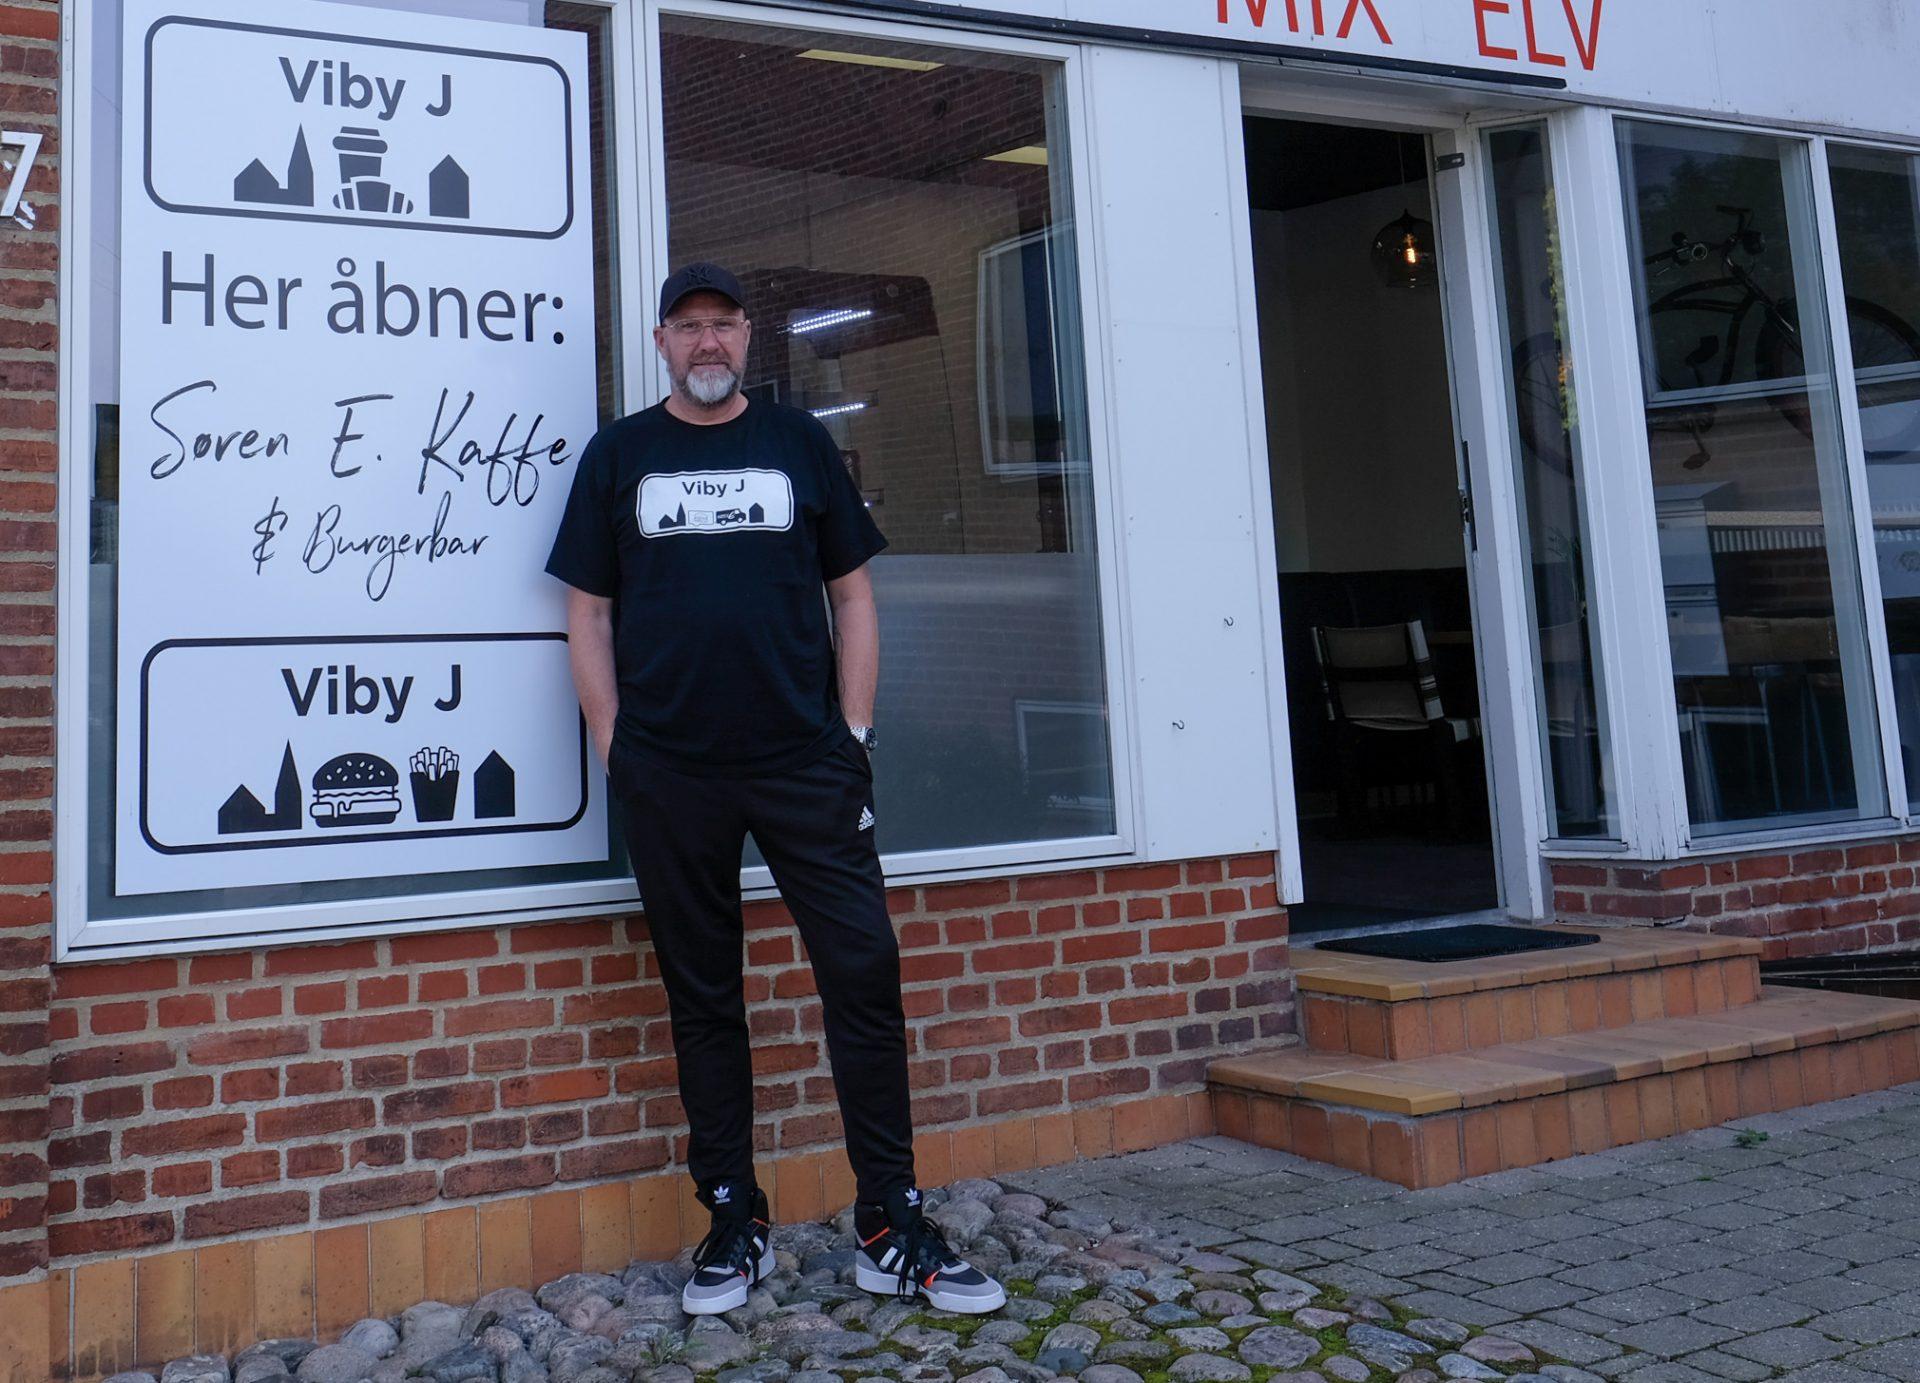 Søren E. udvider: Laver ny cool burger- og kaffebar på Skanderborgvej i Viby